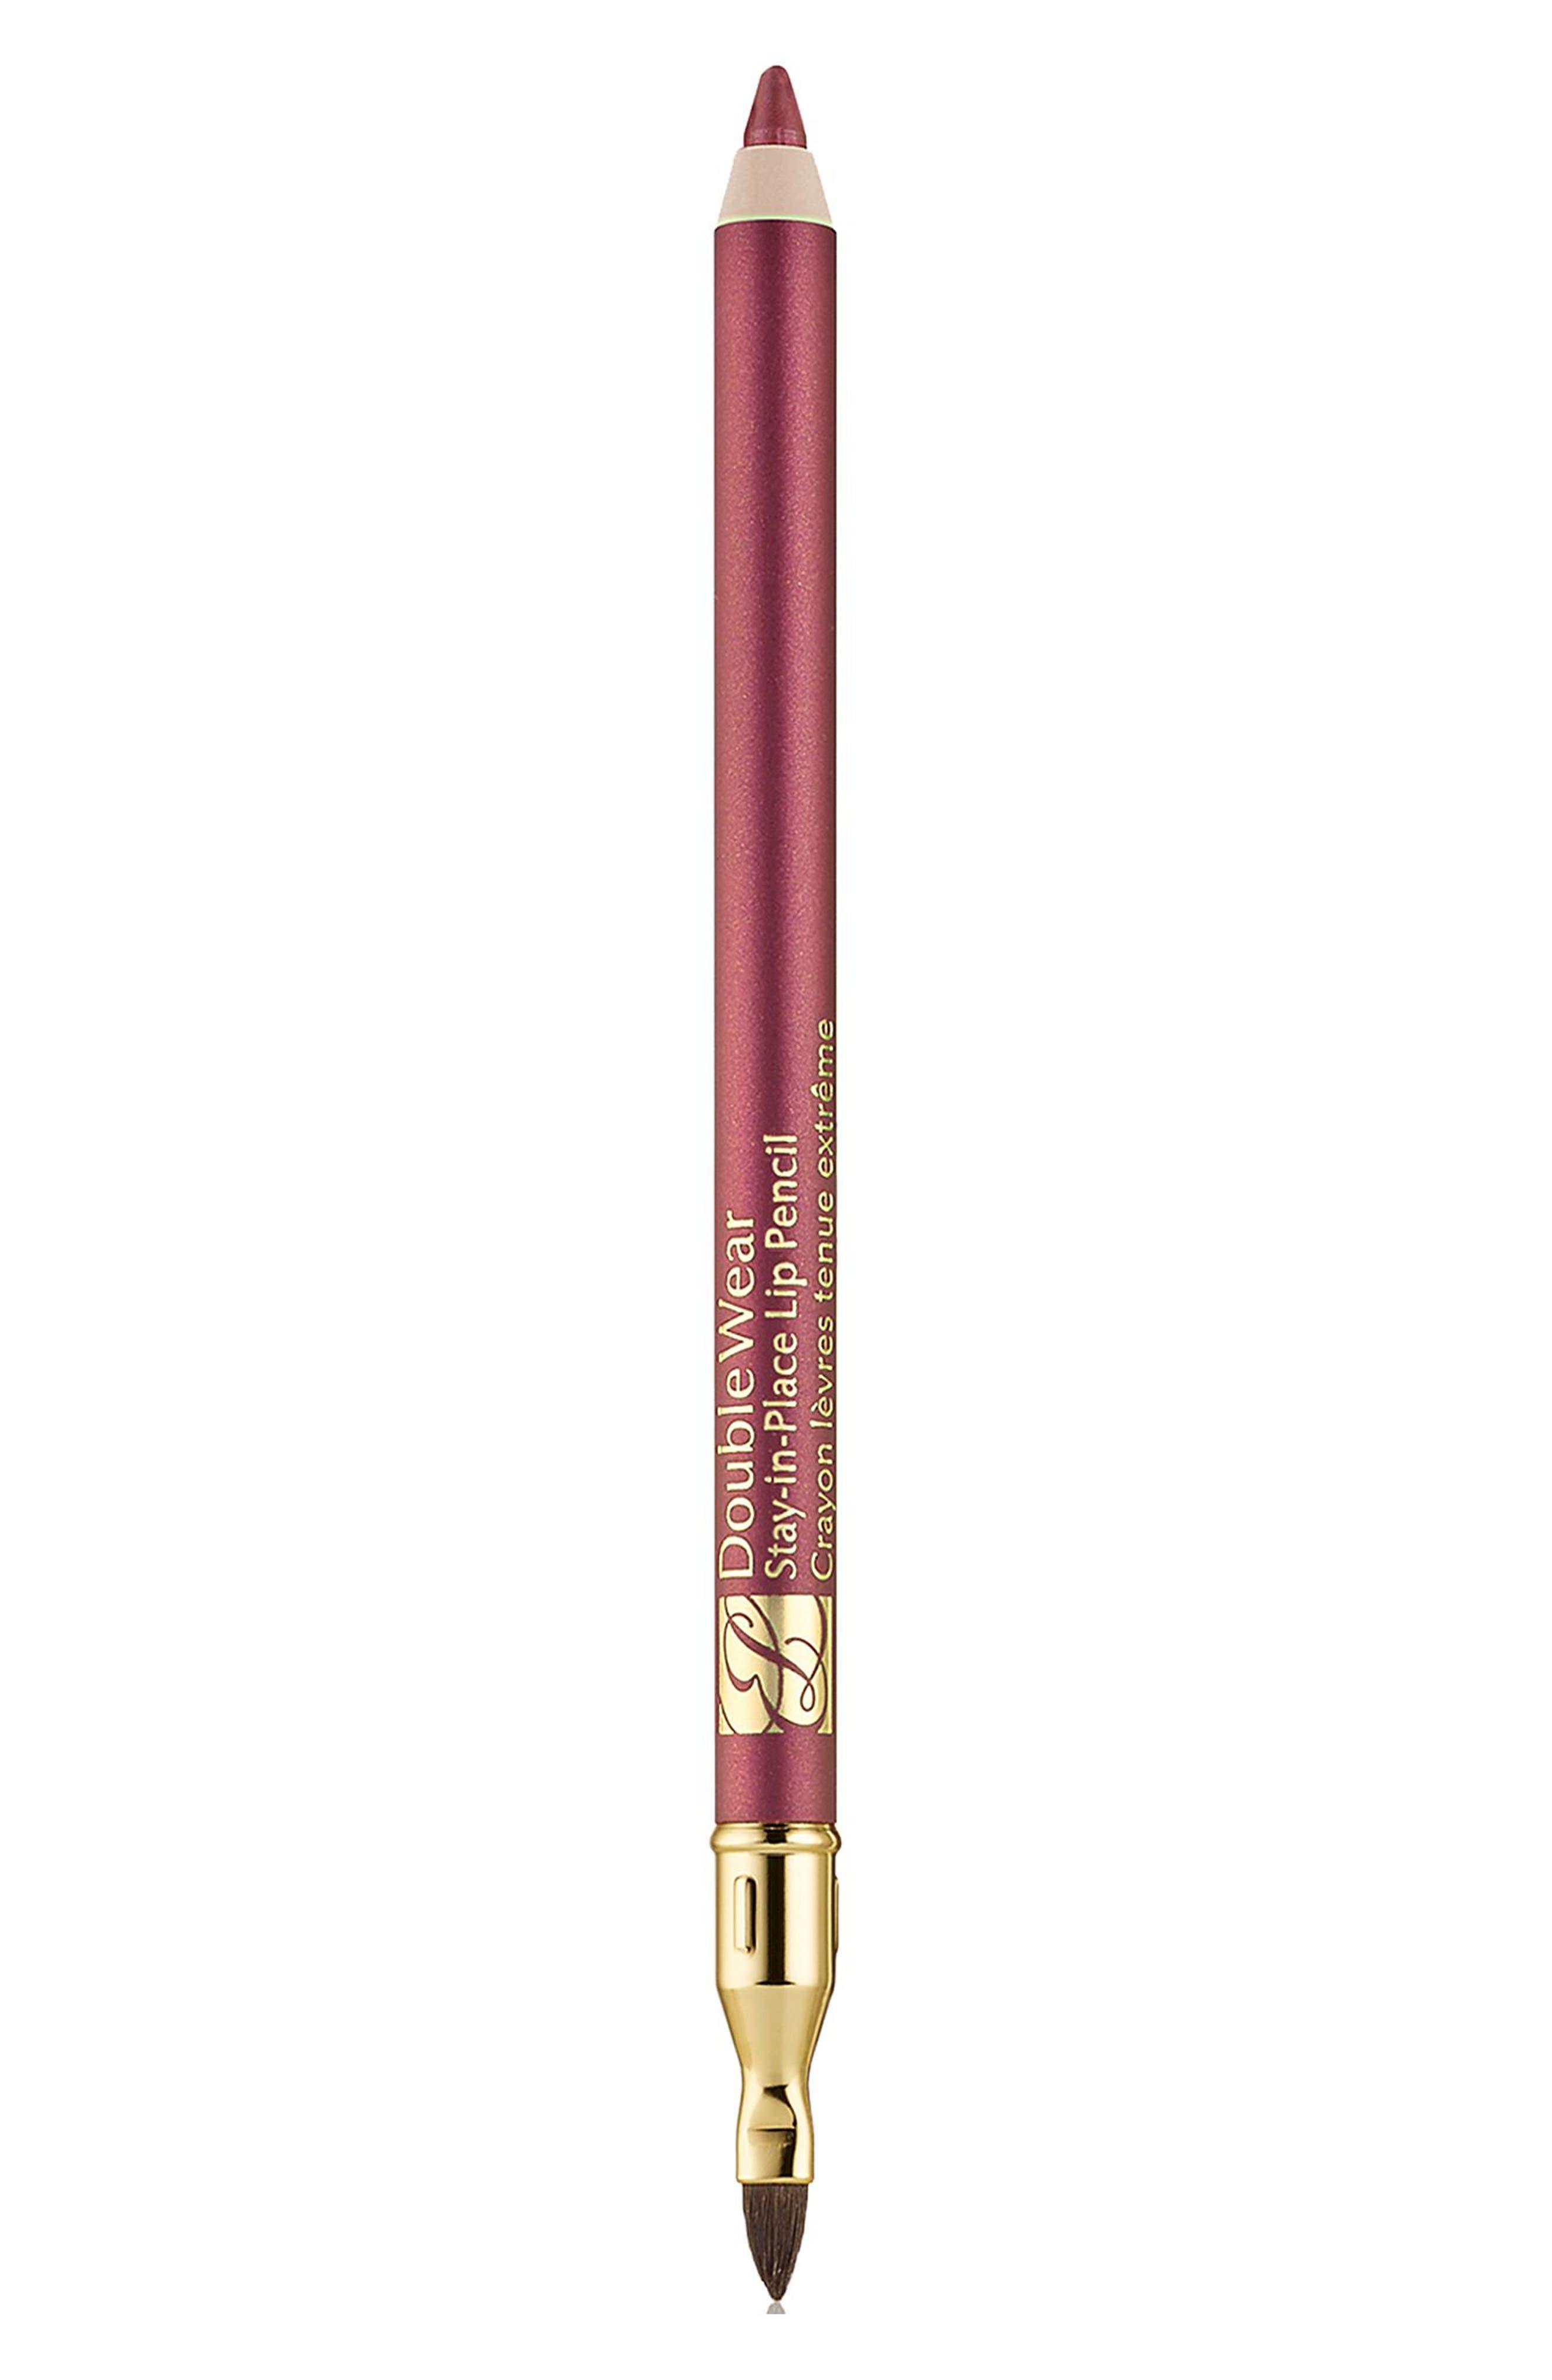 Estee Lauder Double Wear Stay-In-Place Lip Pencil - Mauve